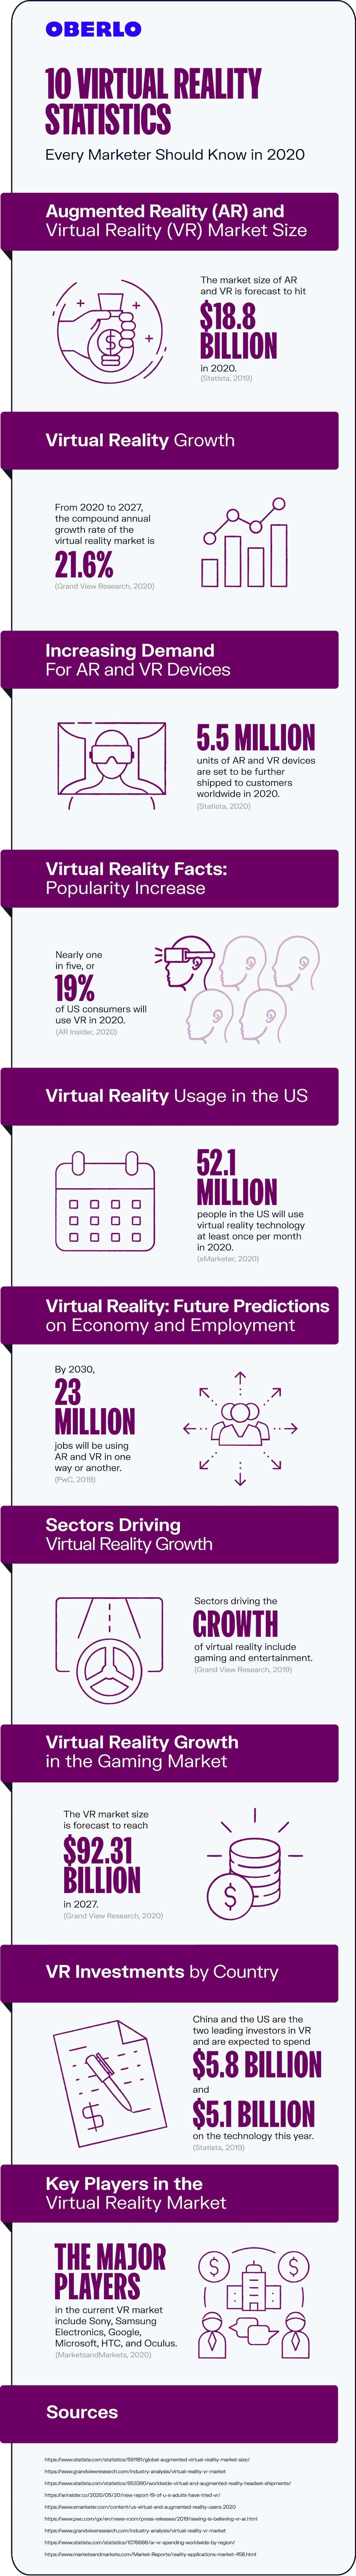 virtual reality statistics 2020